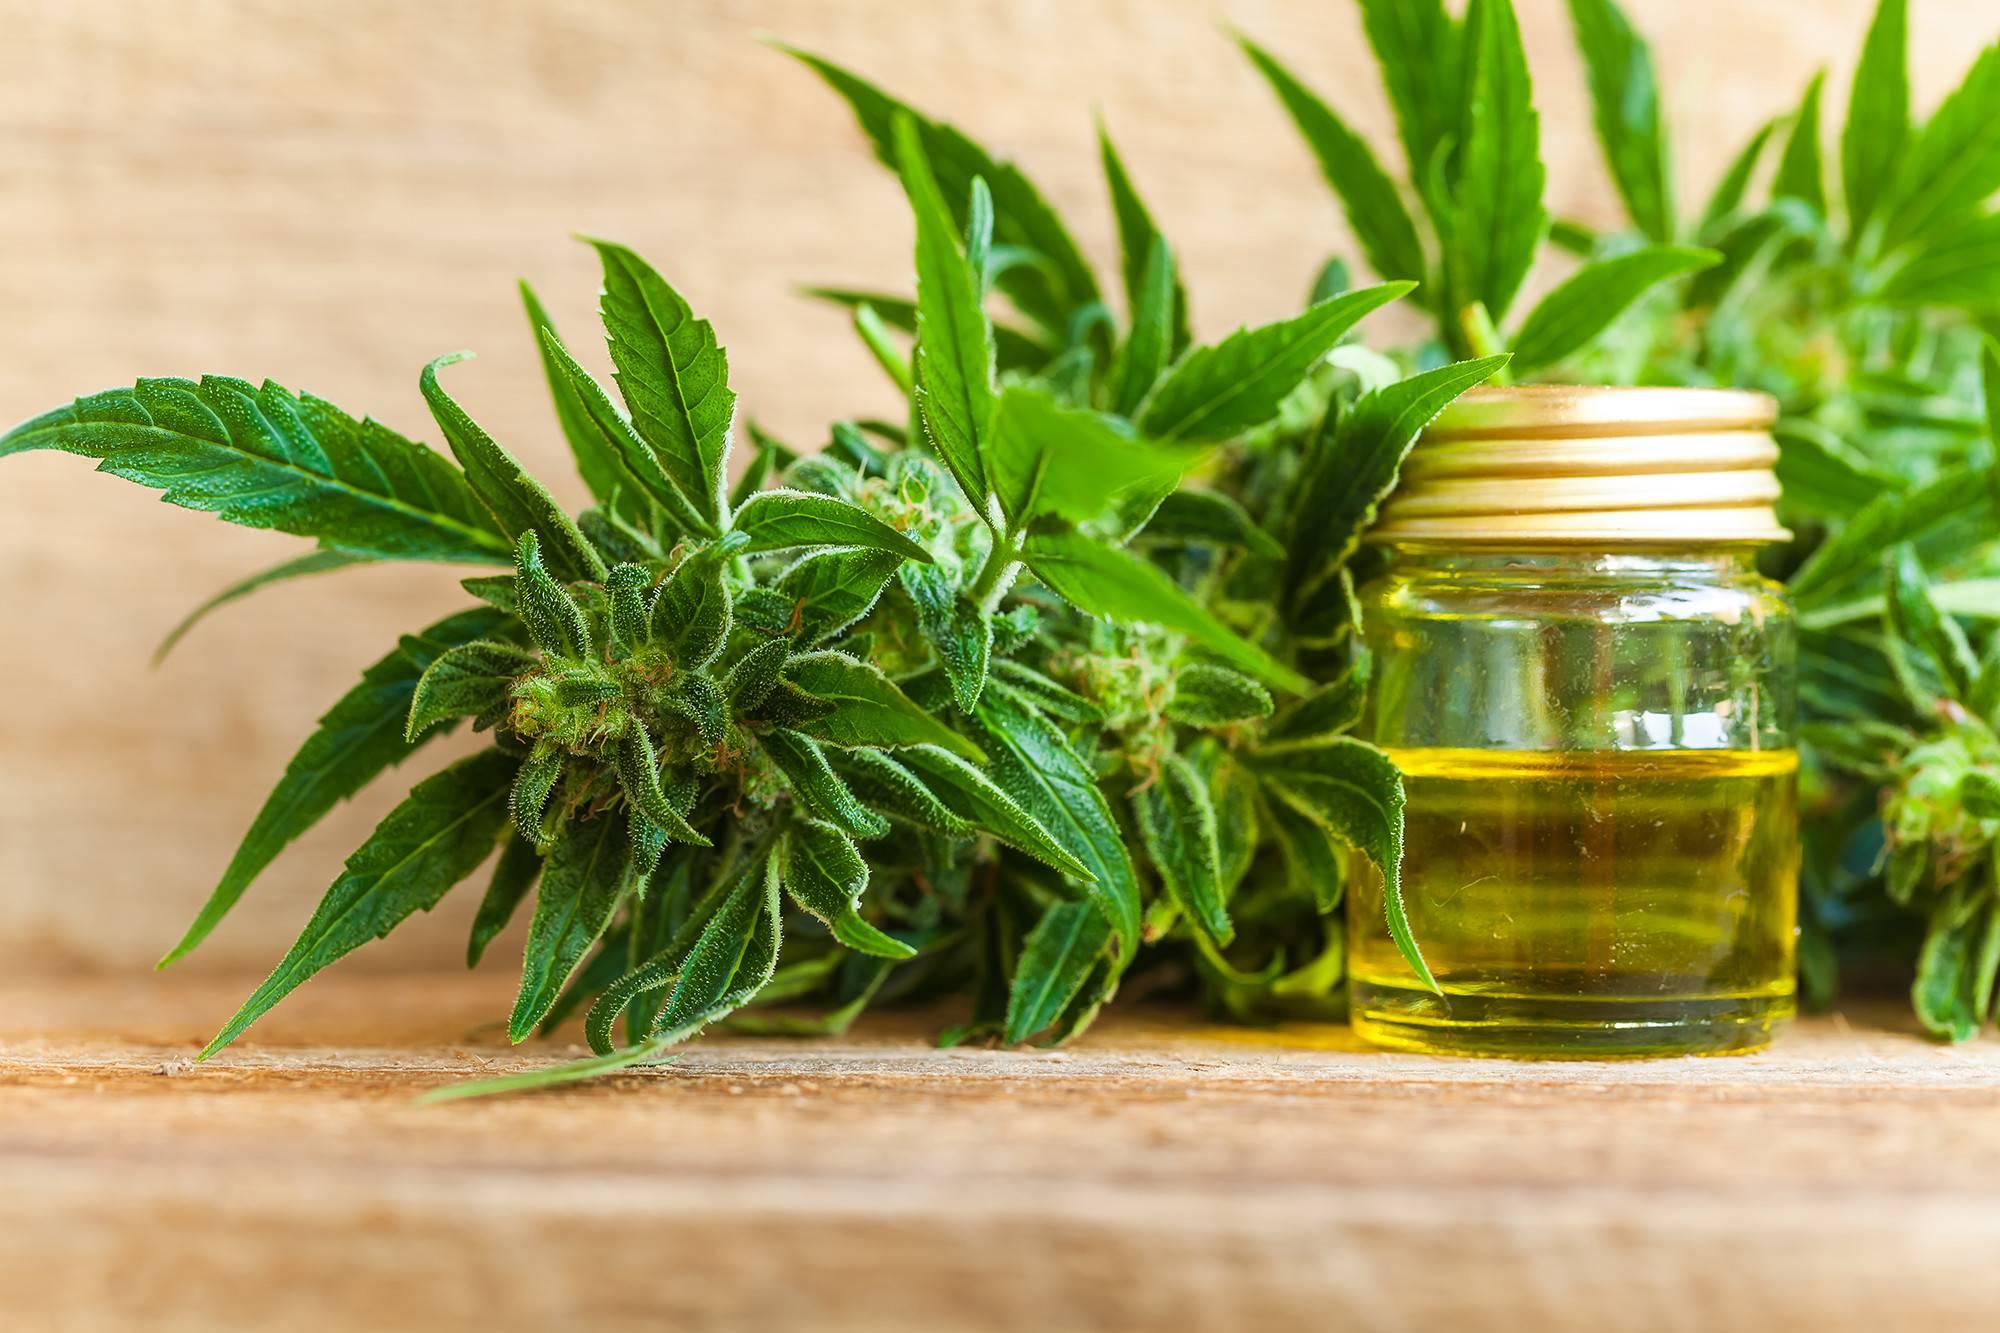 Legalna Marihuana Medyczna, UprawaKonopi